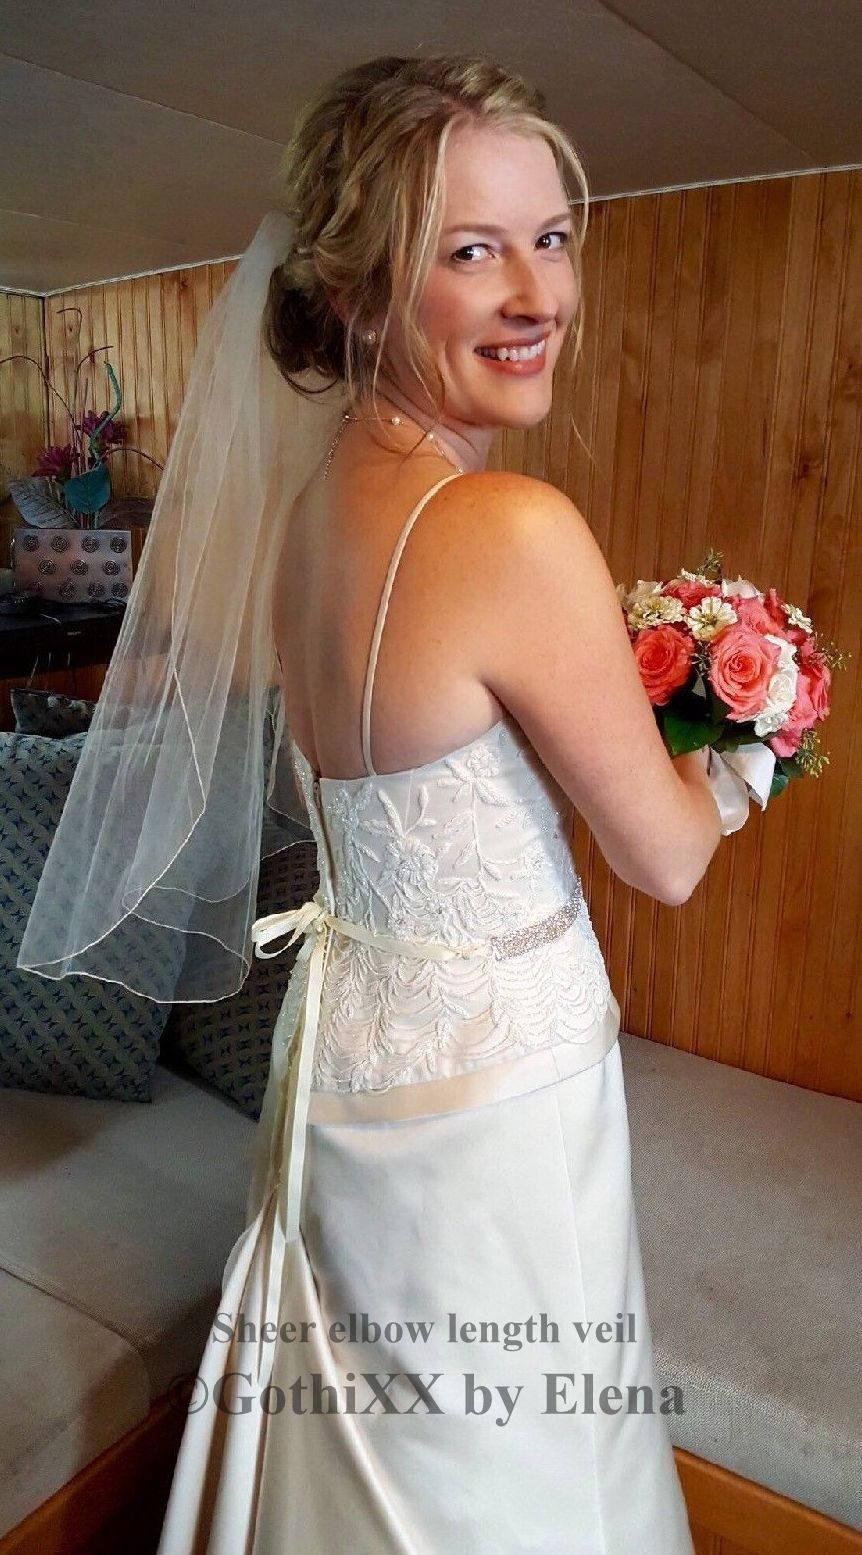 "Hochzeit - Soft Wedding Bridal Veil Sheer Shoulder Elbow Waist Hip length Single Tier 54"" Width Pencil Edge 30 Colors Made in USA"